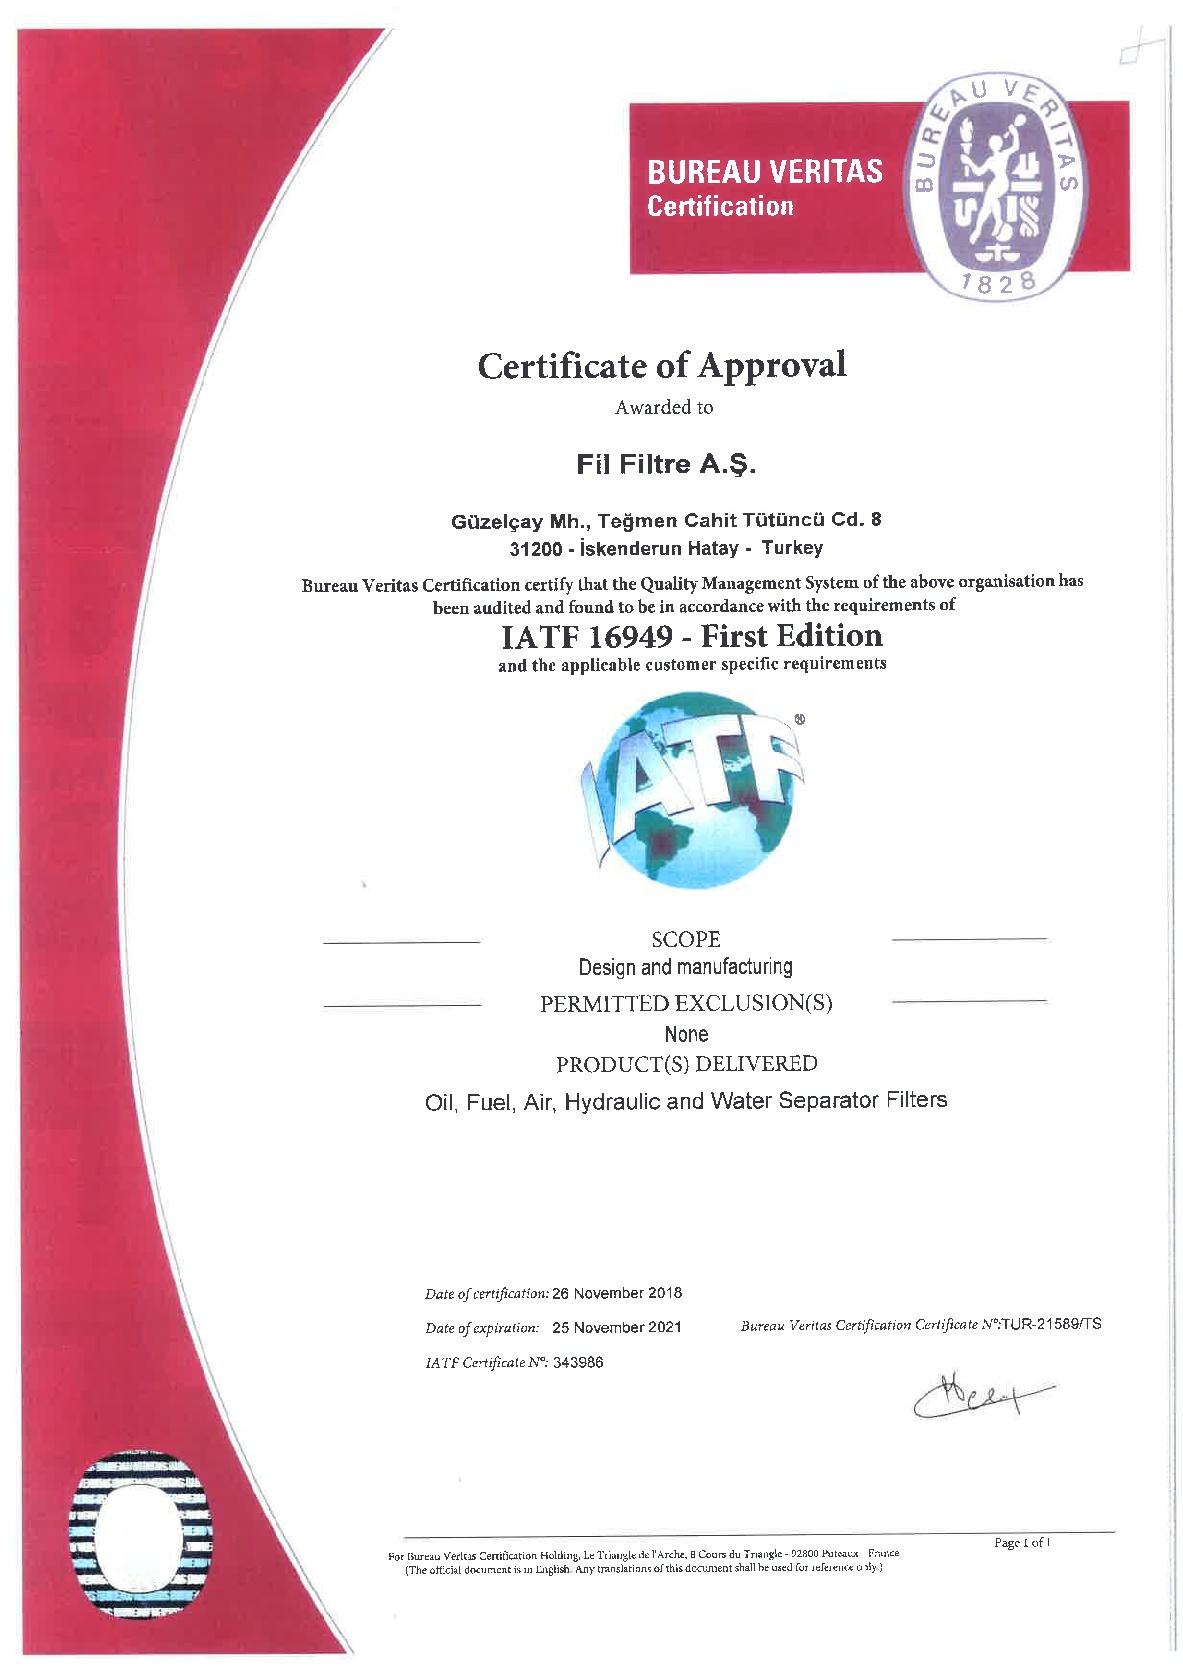 IATF 16949 - First Edition